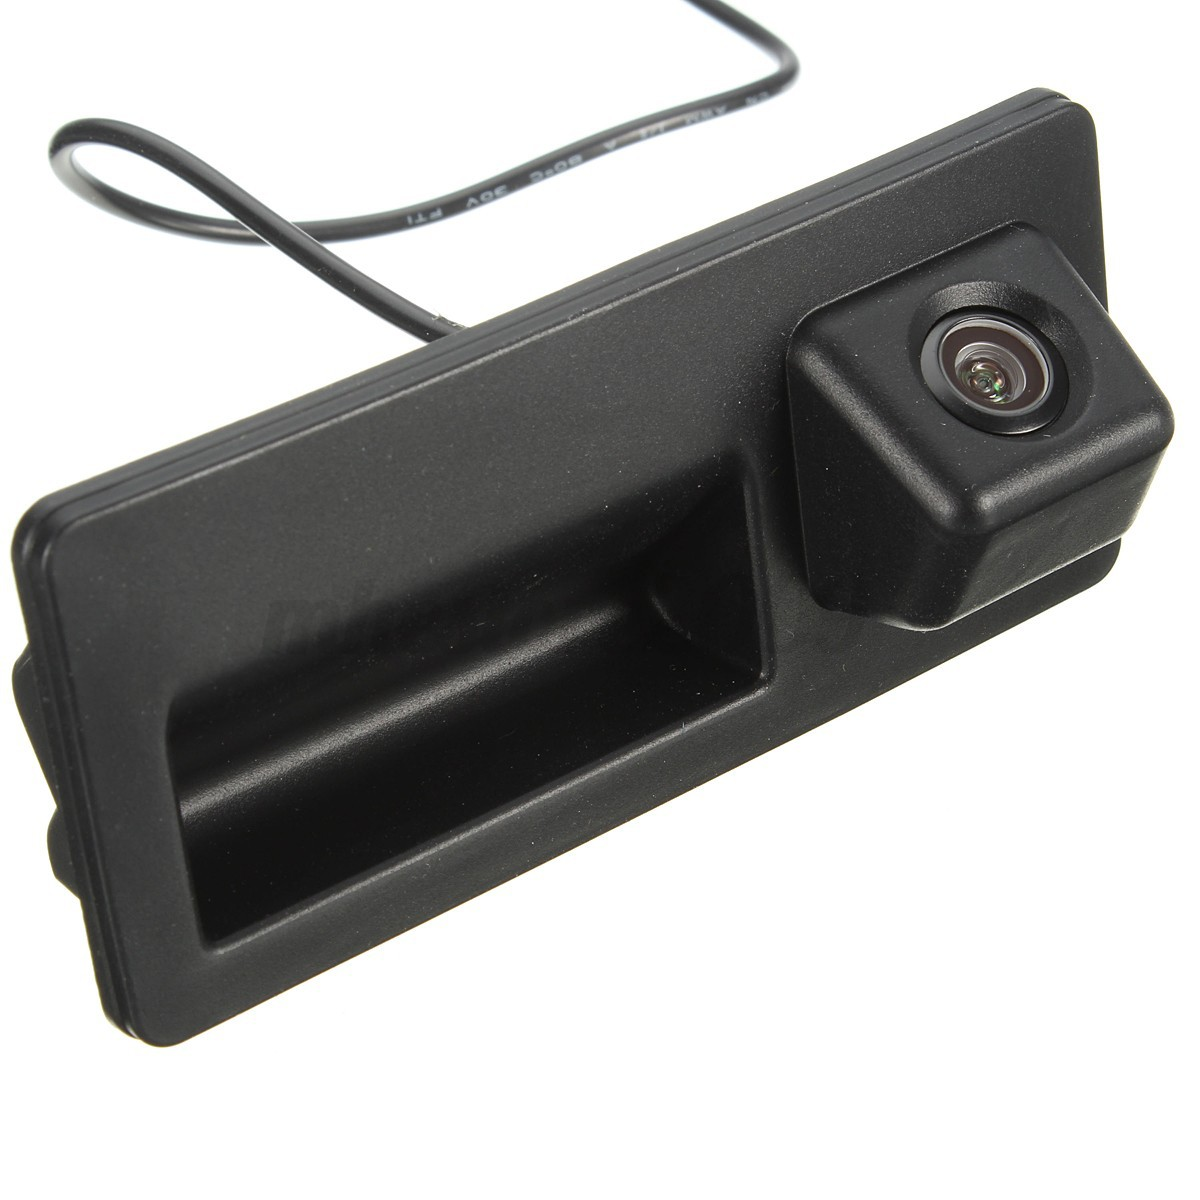 reversing rear view camera for vw golf jetta tiguan rcd510 rns315 rns310 rns510 ebay RNS 315 Update RNS 310